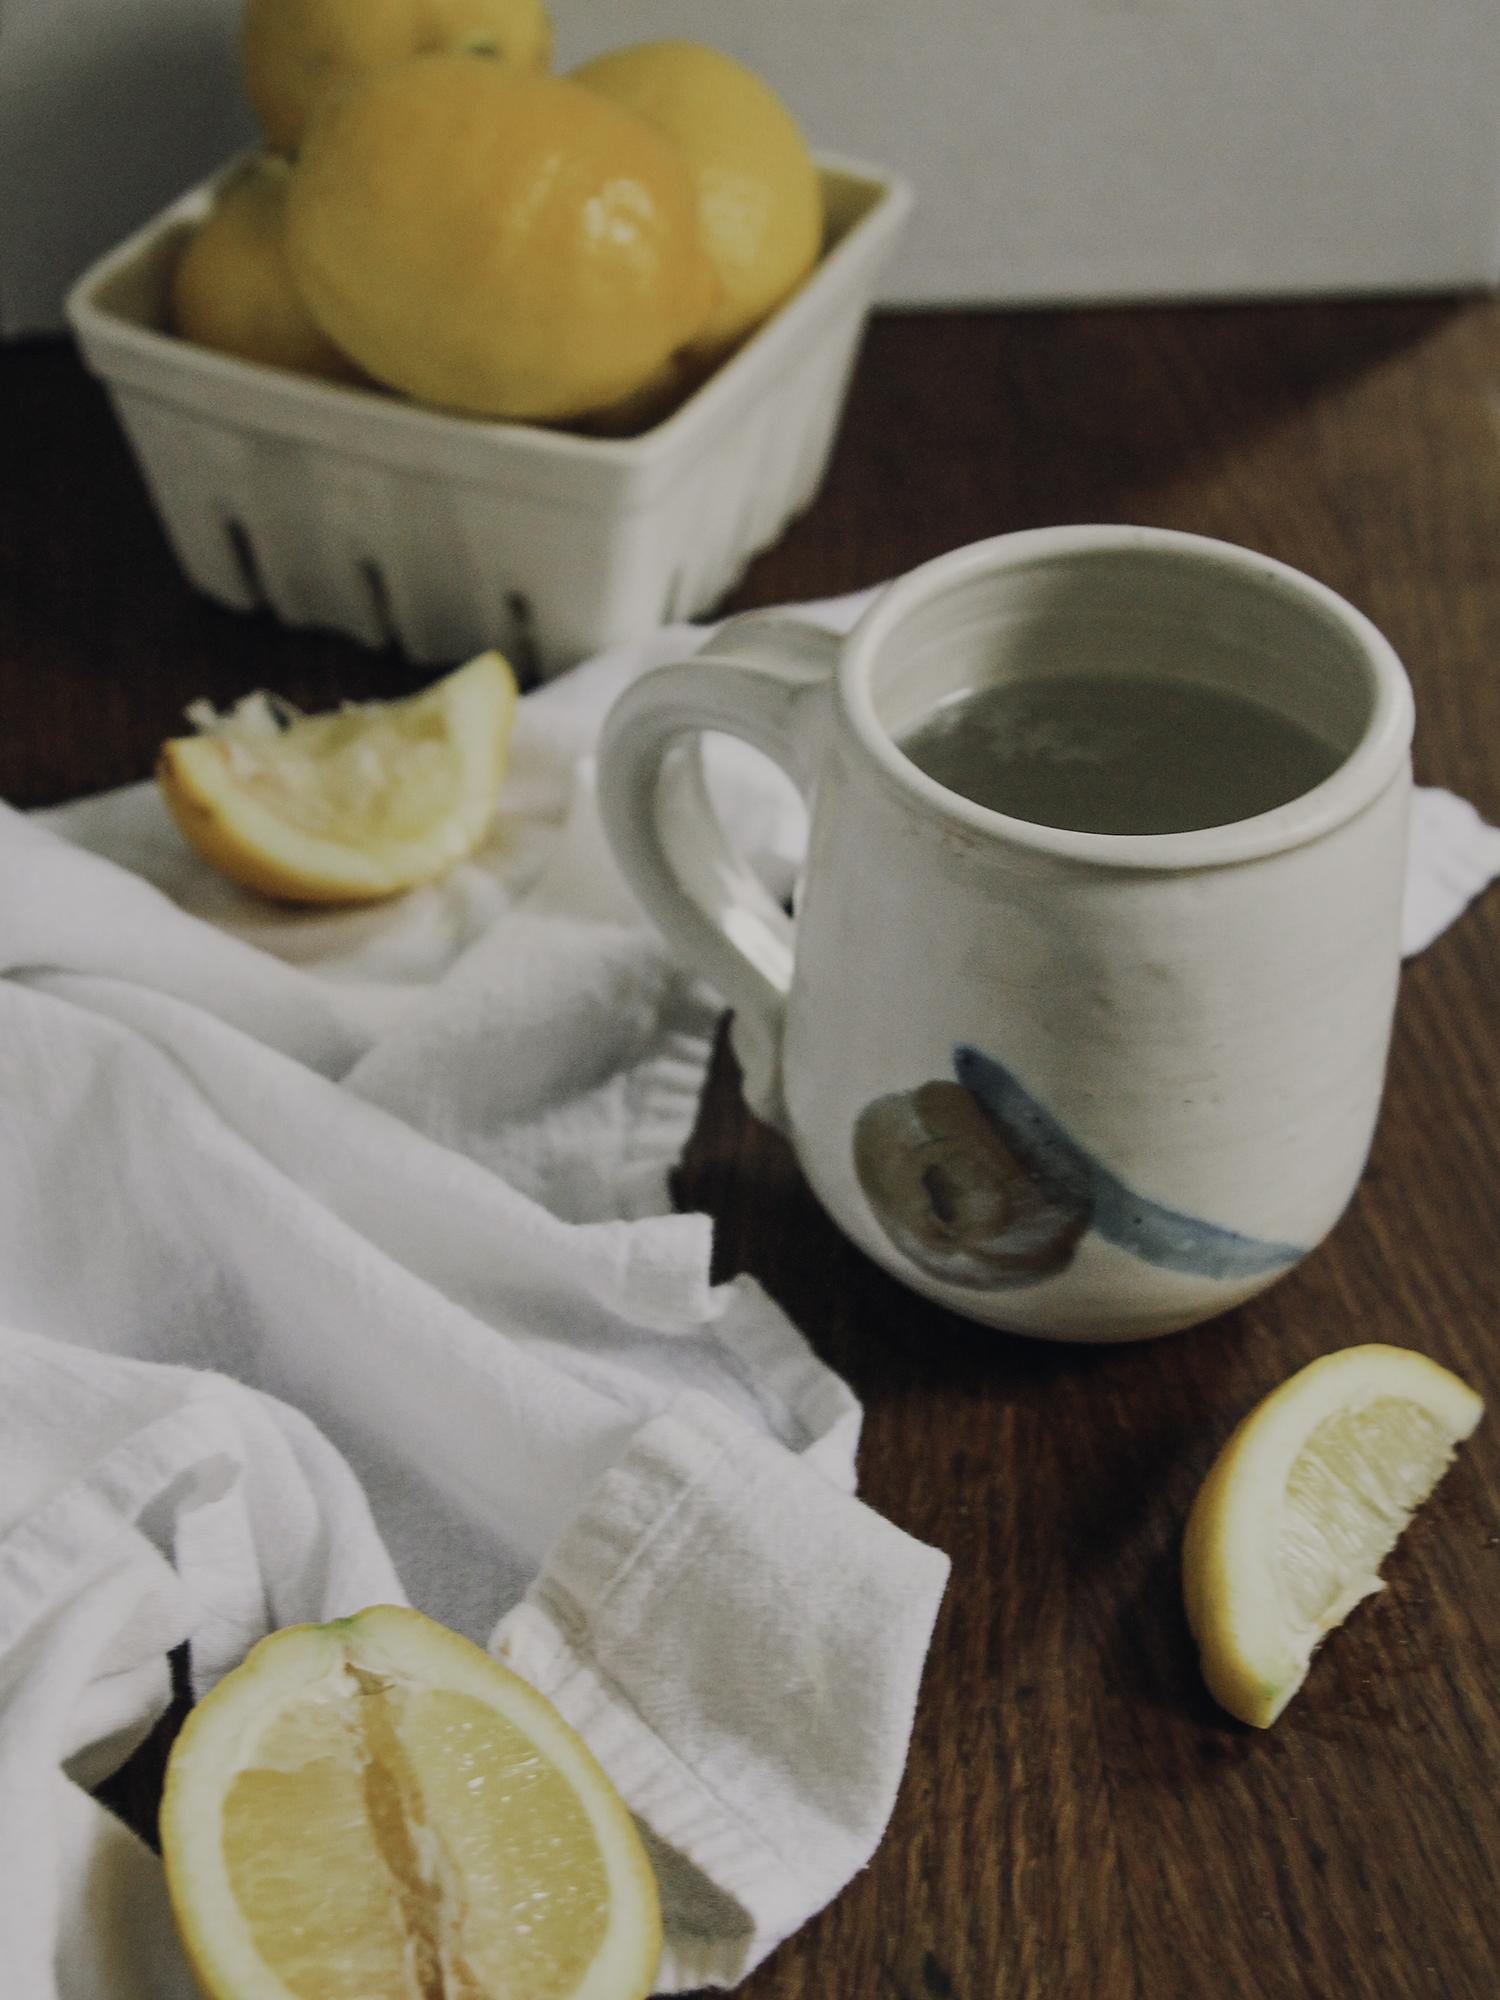 kicking caffeine | warm lemon water trick | via: chatham st. house